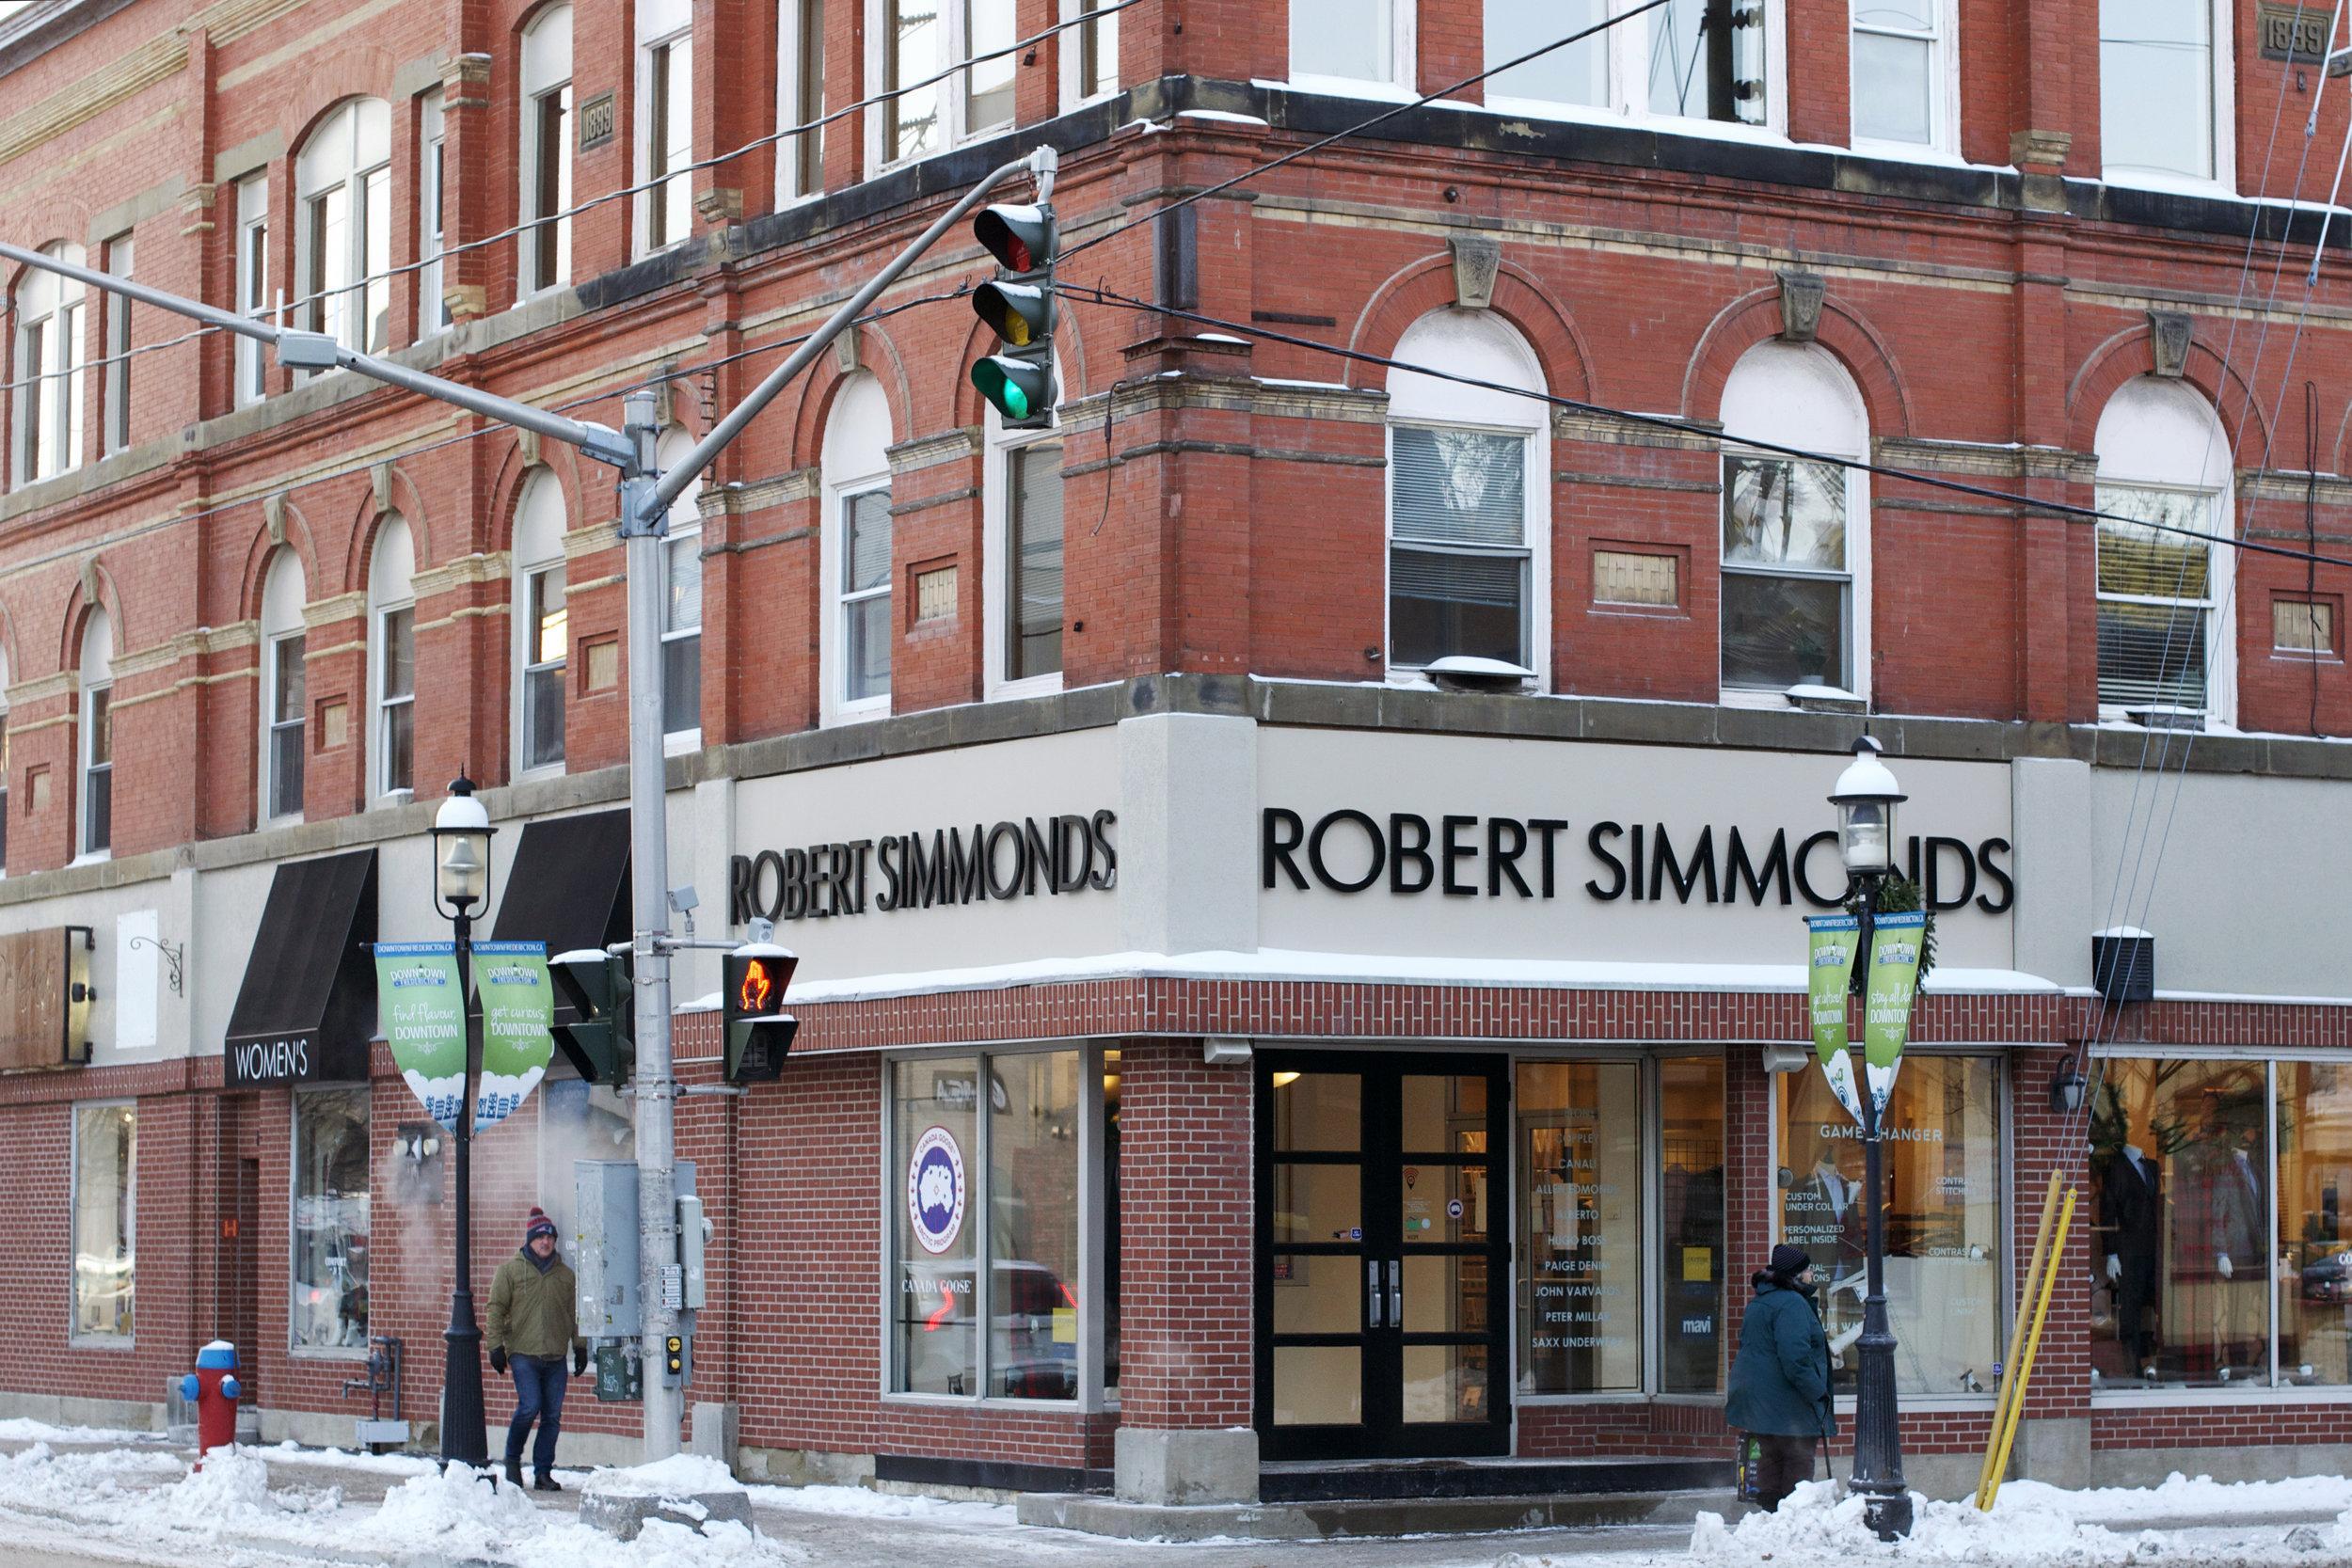 Robert-Simmonds-storefront.jpg